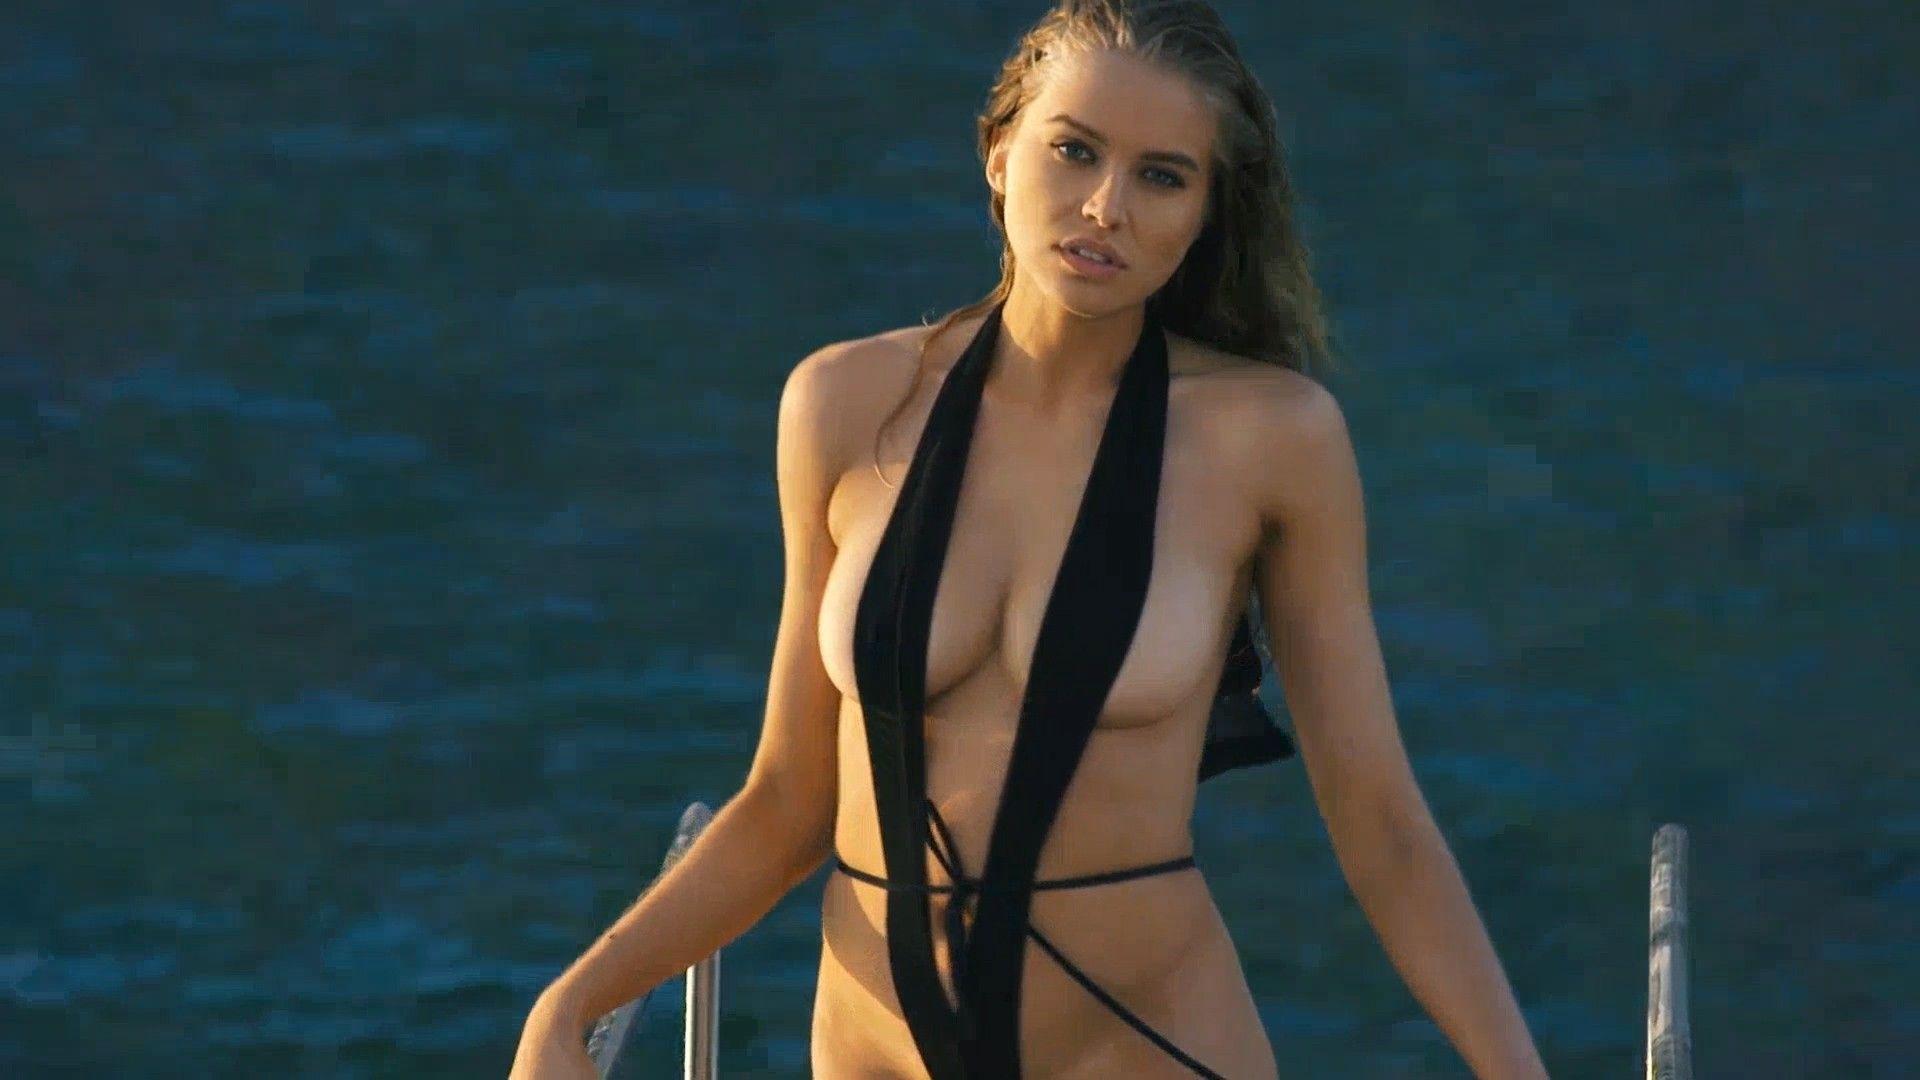 swimsuit models nude milf lesbians orgy